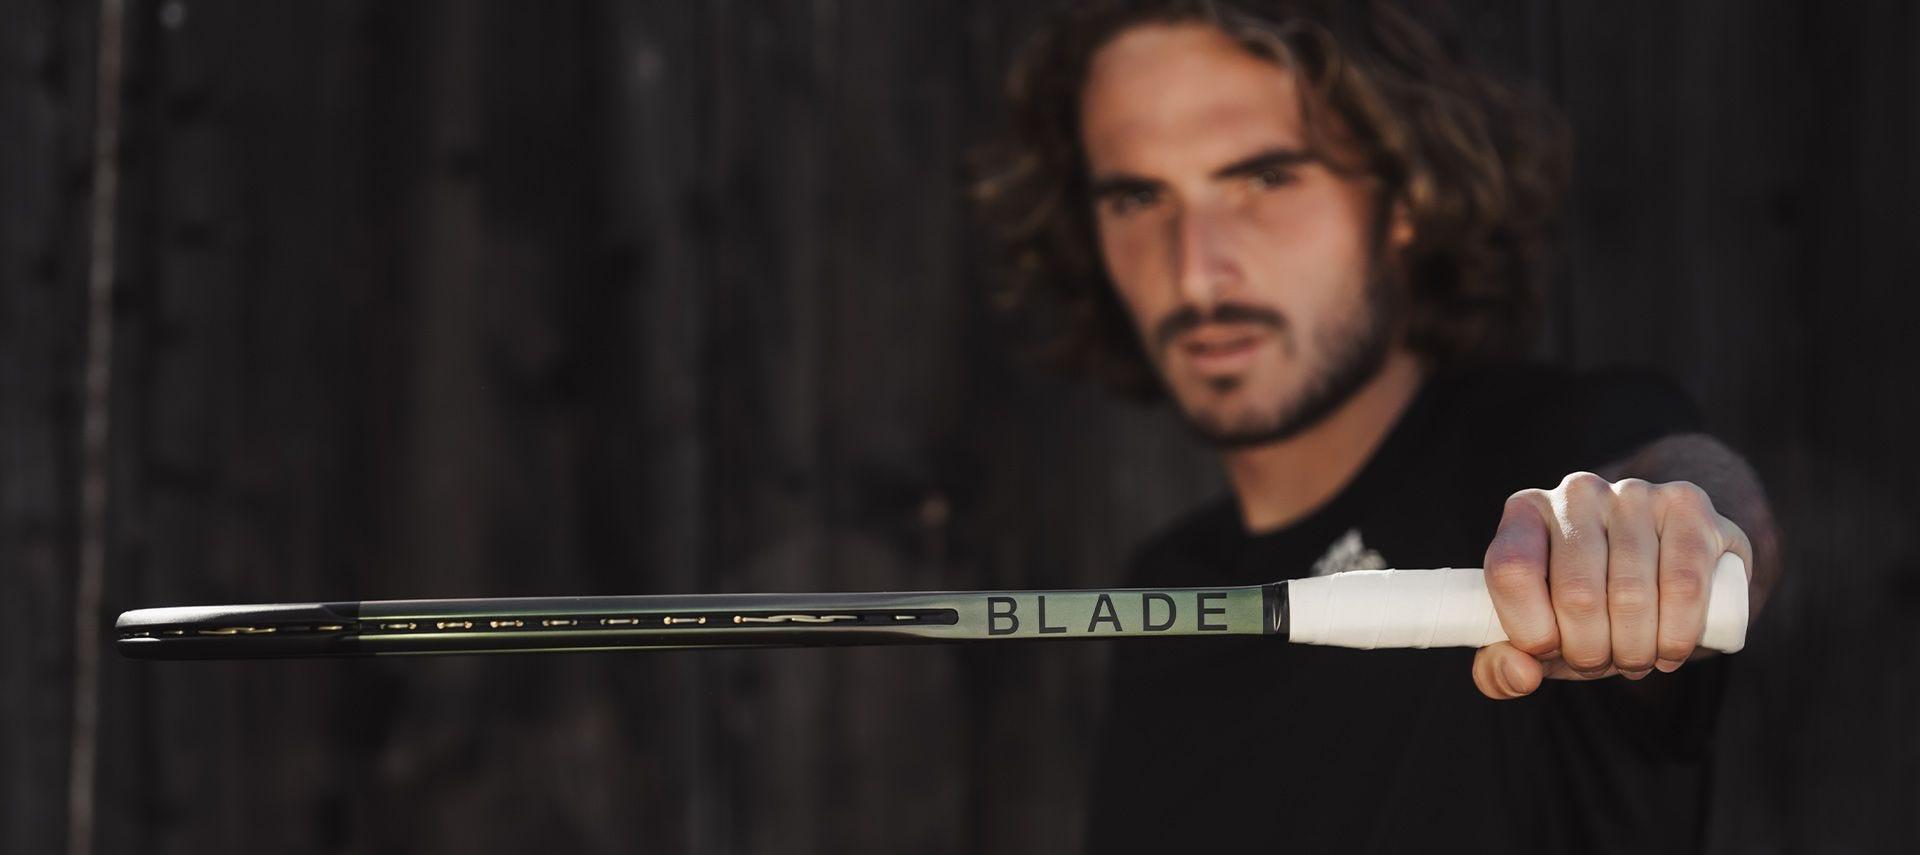 Stefanos Tsitsipas holding a blade v8